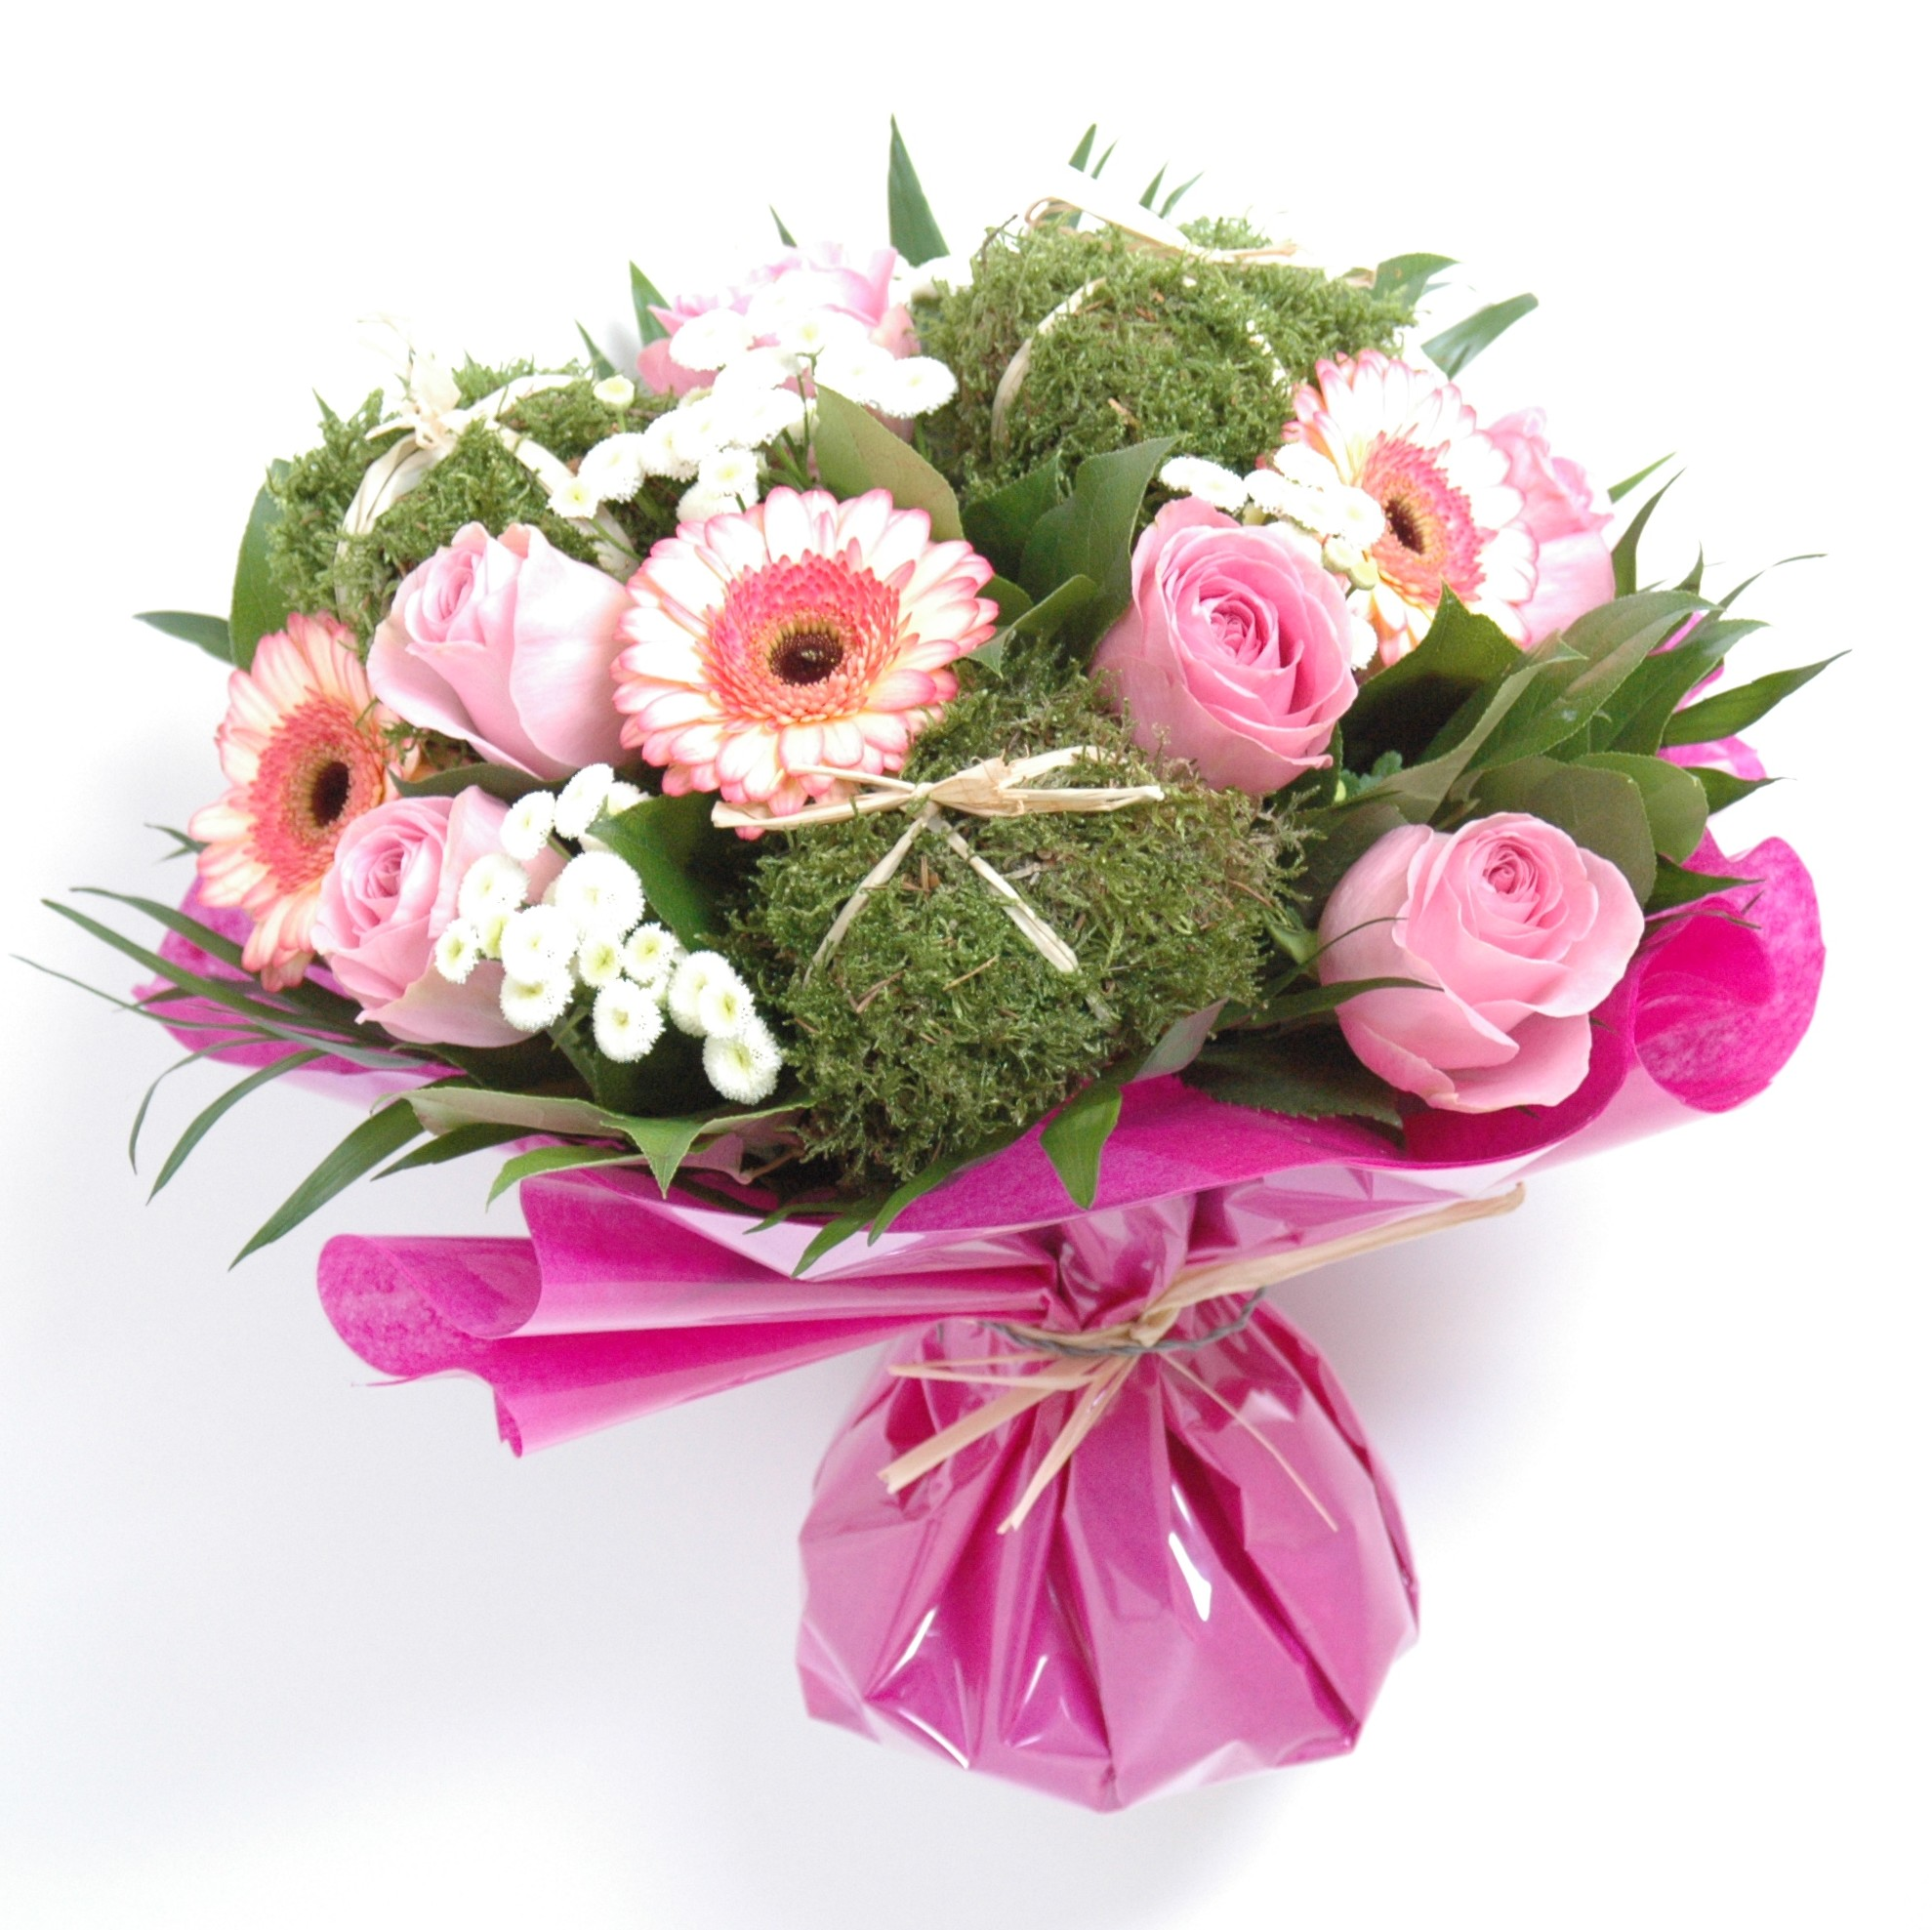 Fleuriste chamb ry 73 livraison de fleurs chamb ry for Livraison de fleurs demain